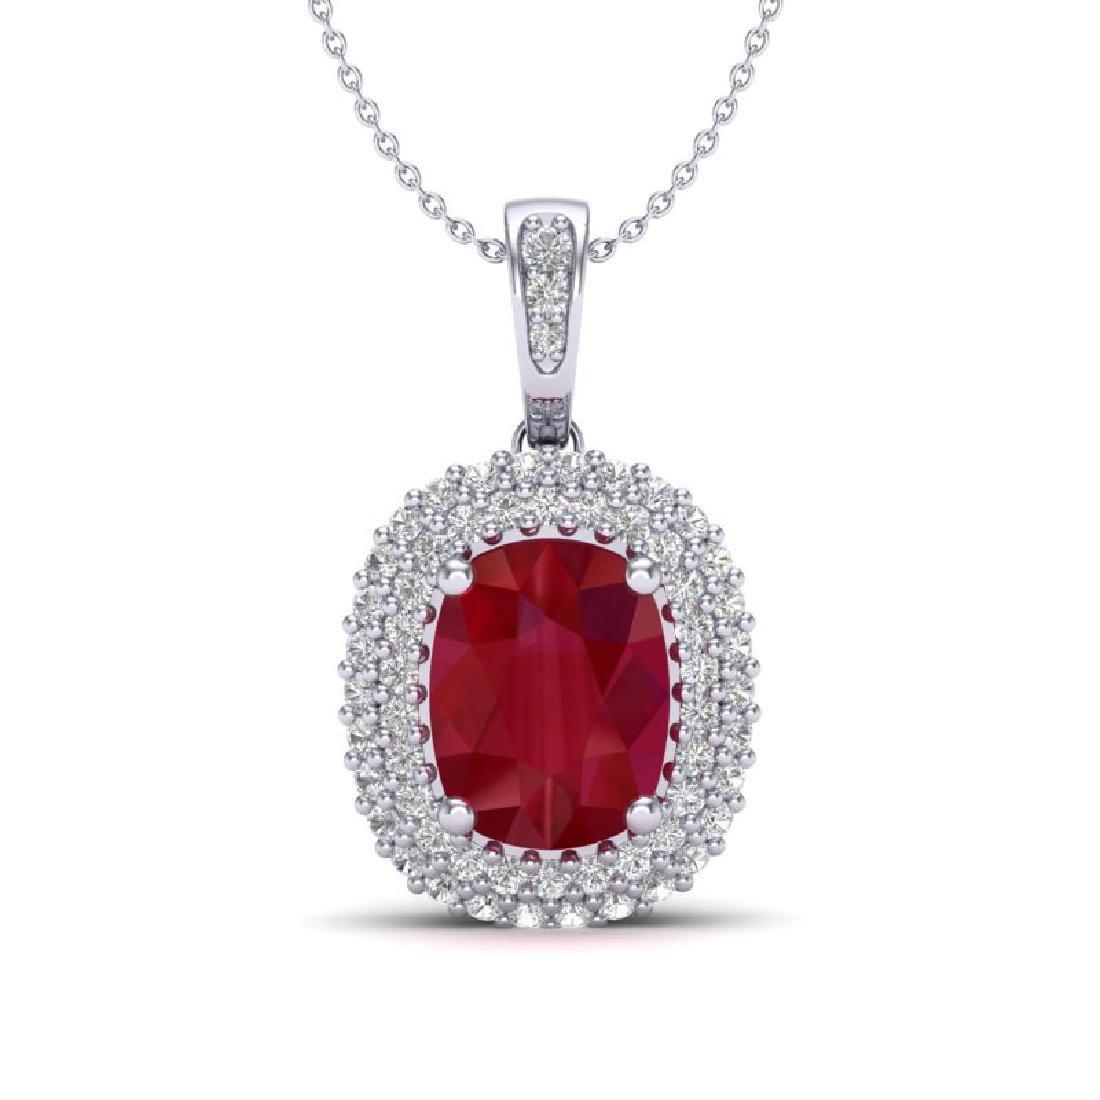 3.15 CTW Ruby & Micro Pave VS/SI Diamond Halo Necklace